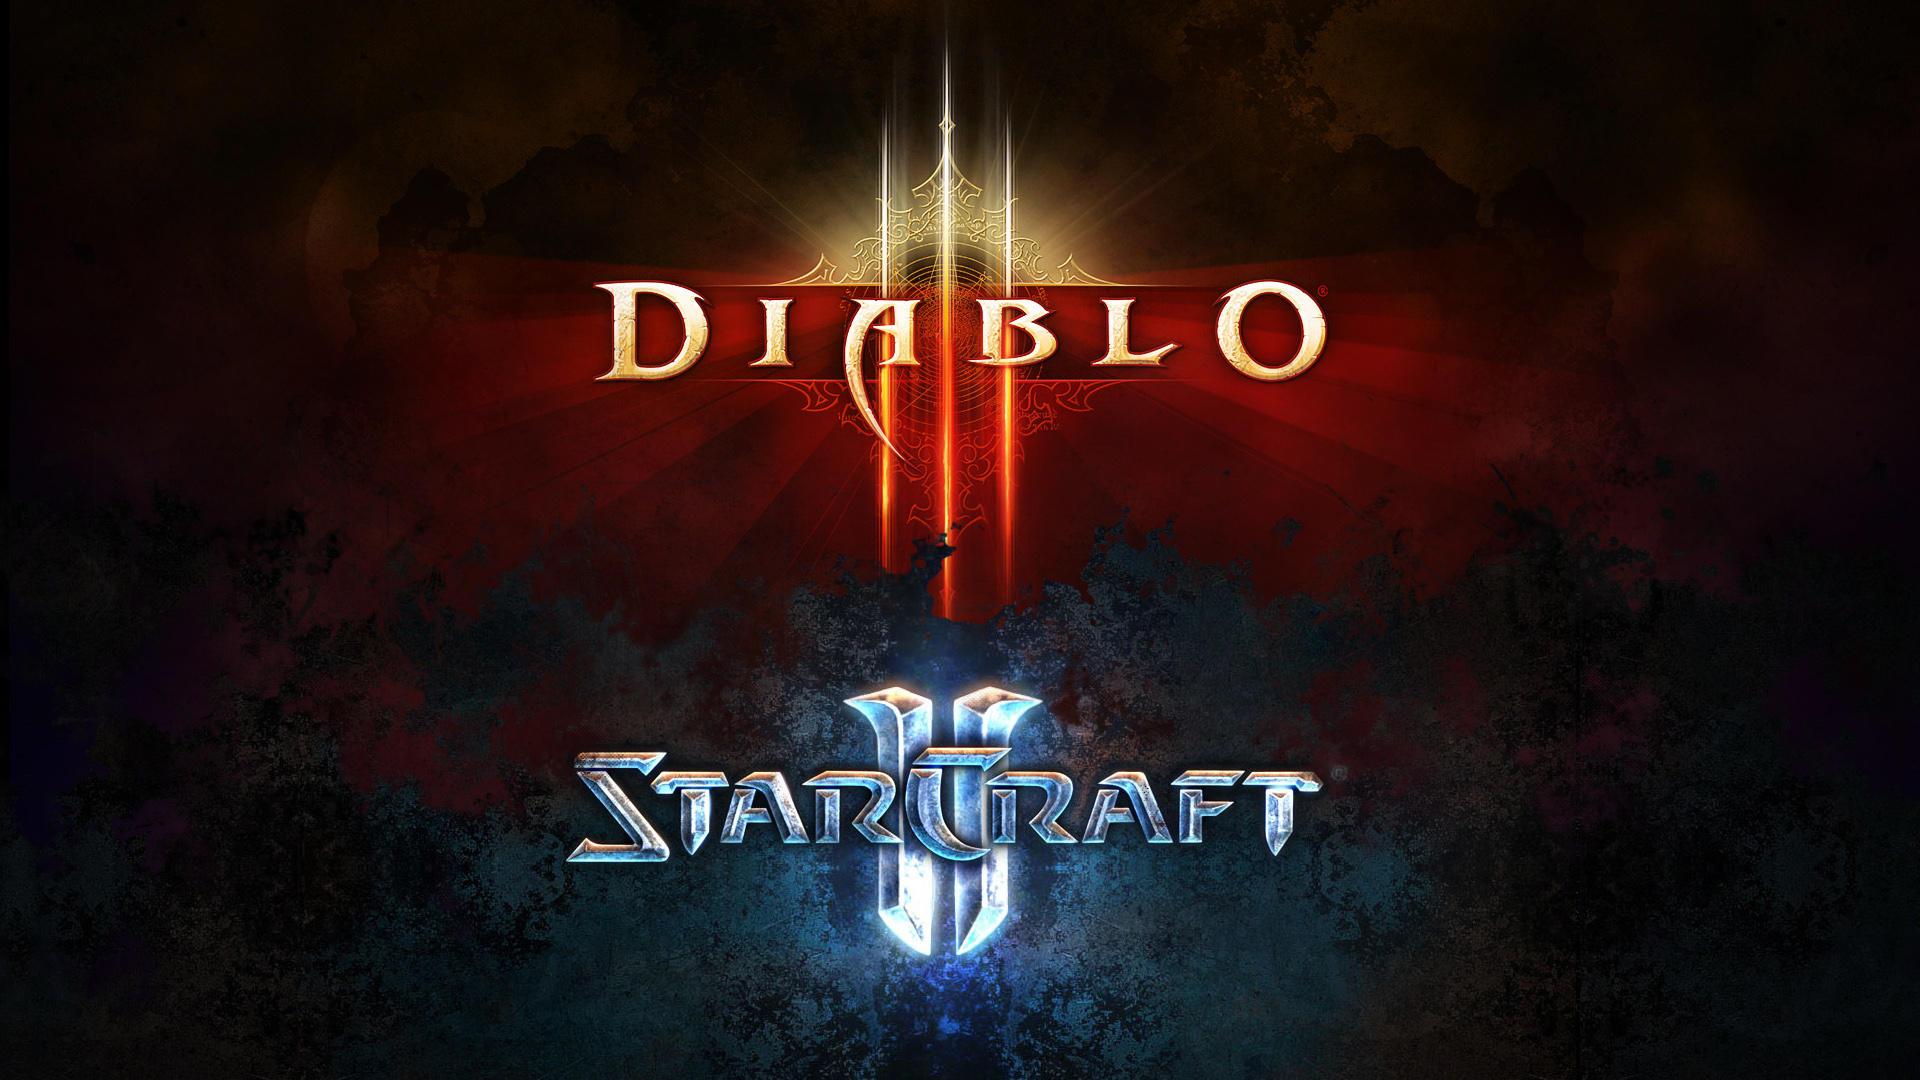 Diablo 3 vs StarCraft 2 by hafele